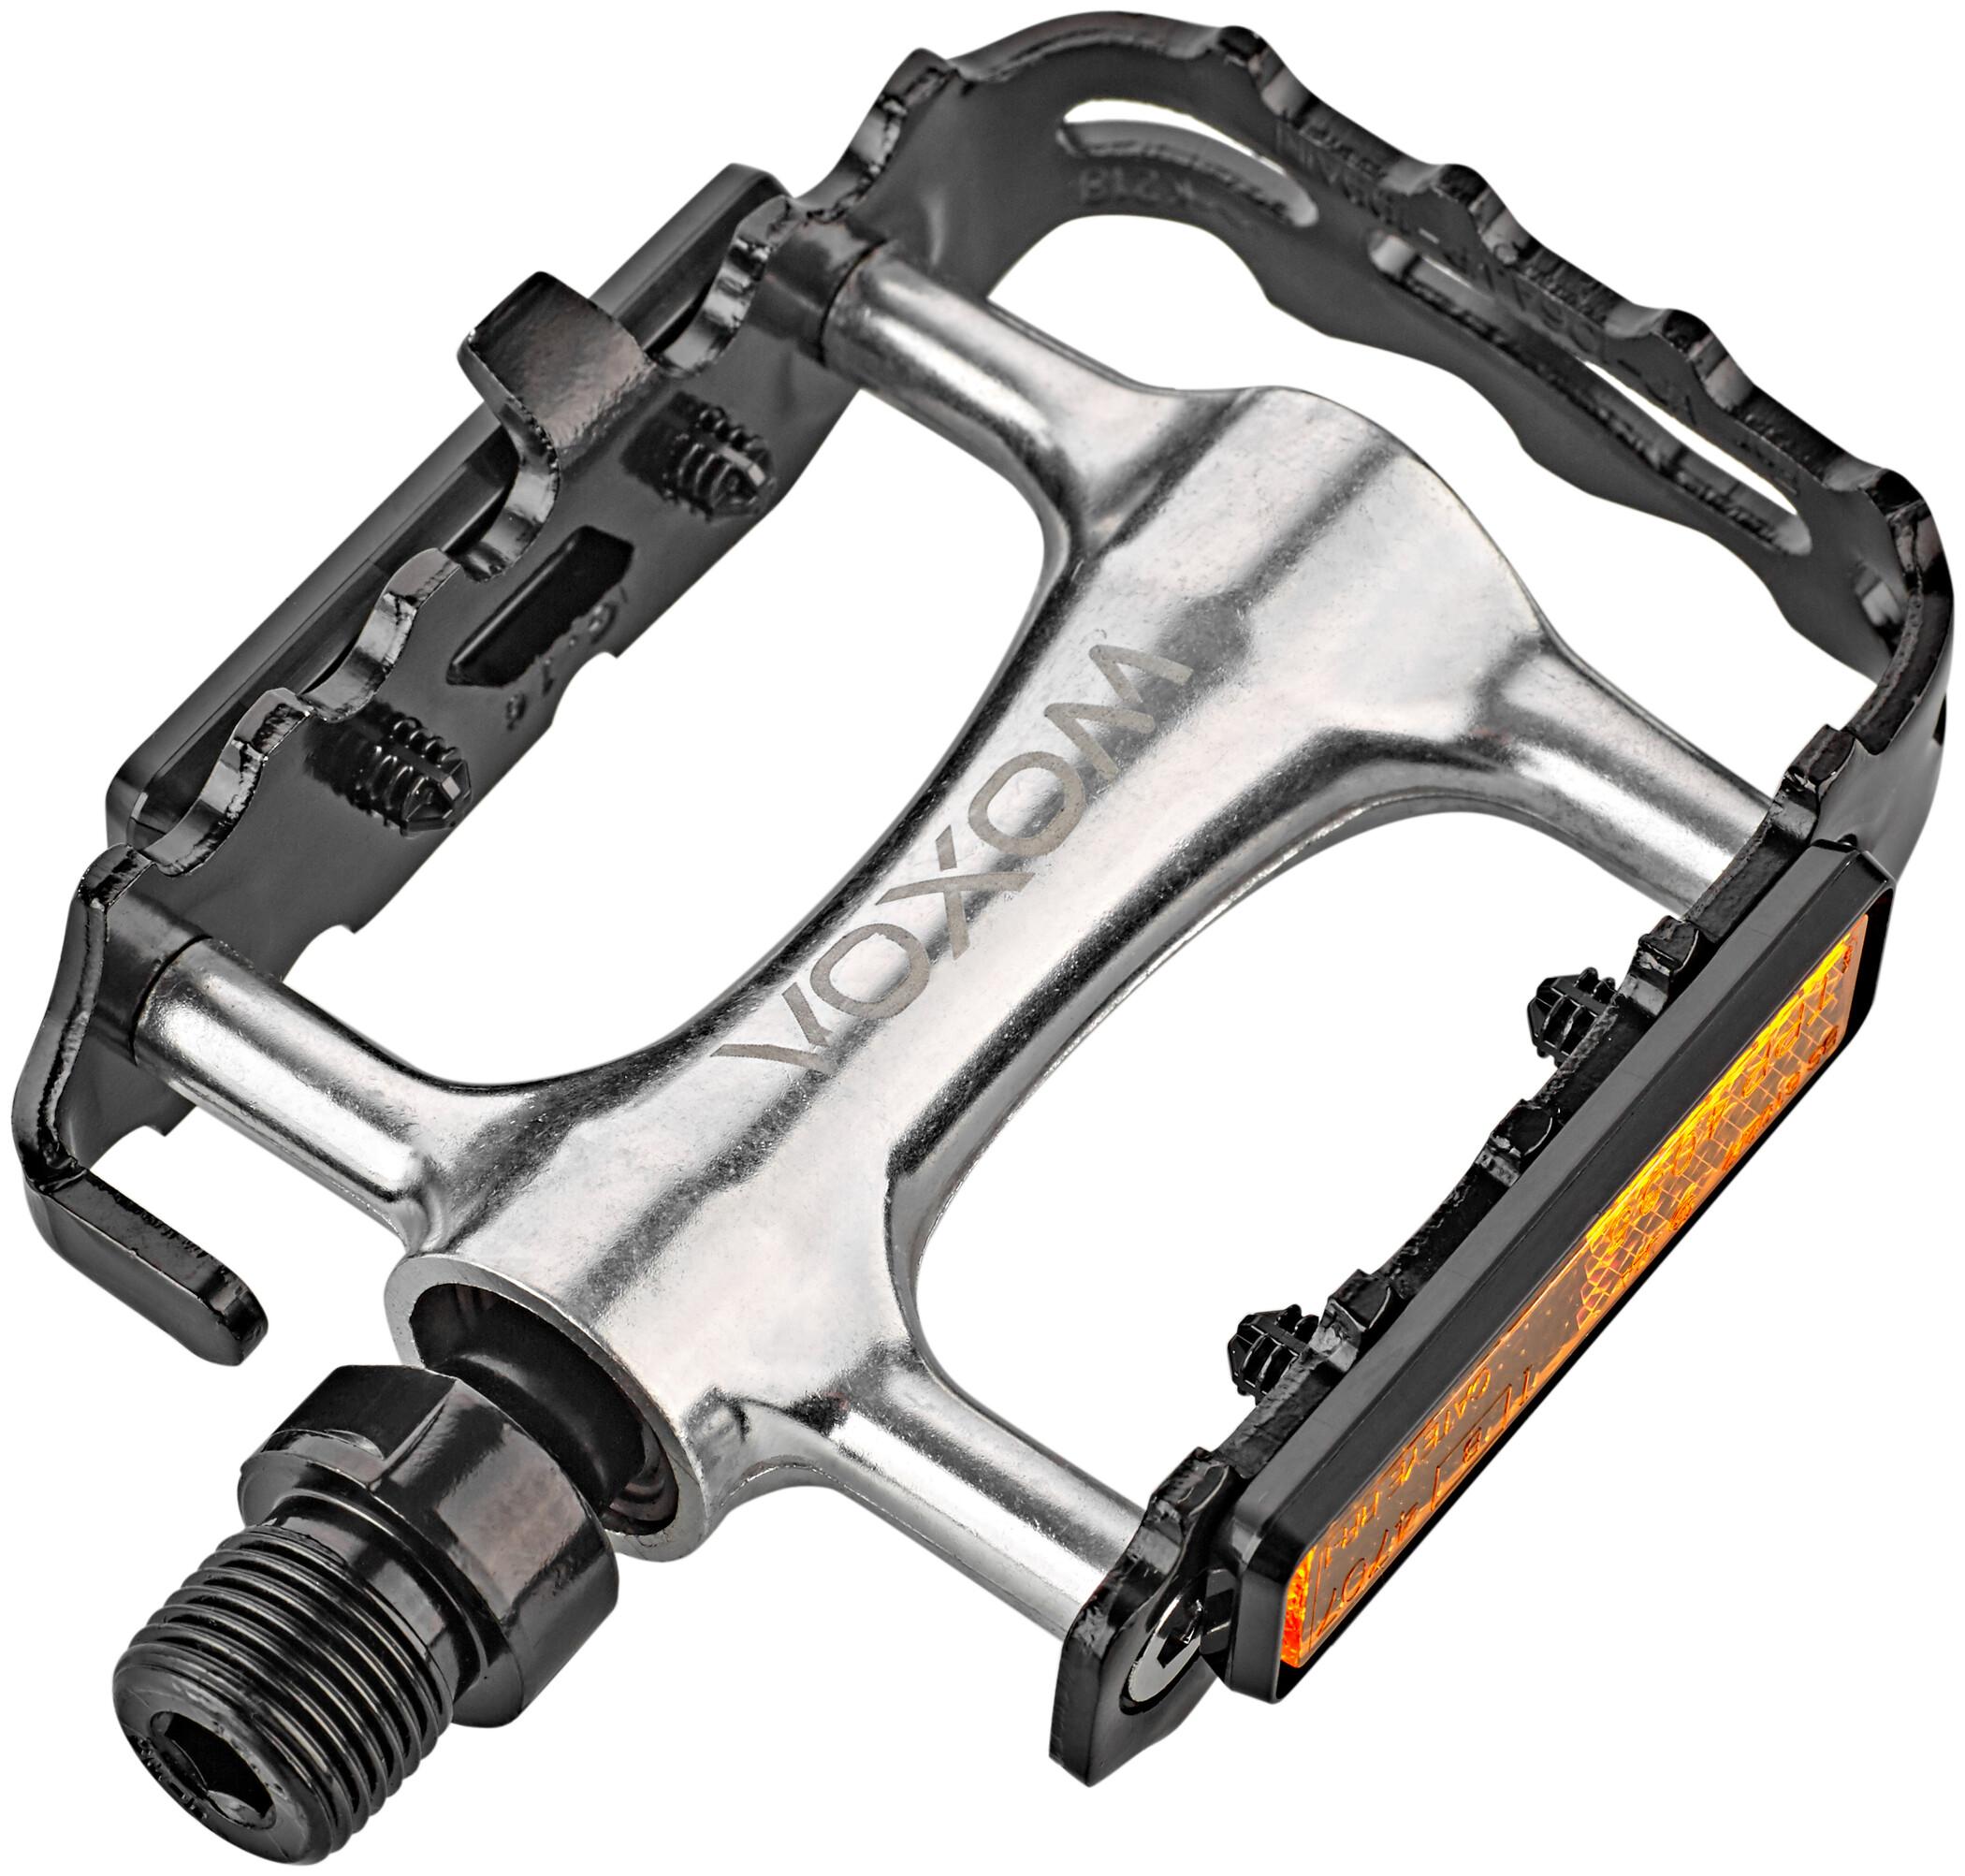 Voxom Touring Pe5 Pedaler, black (2019)   Pedals